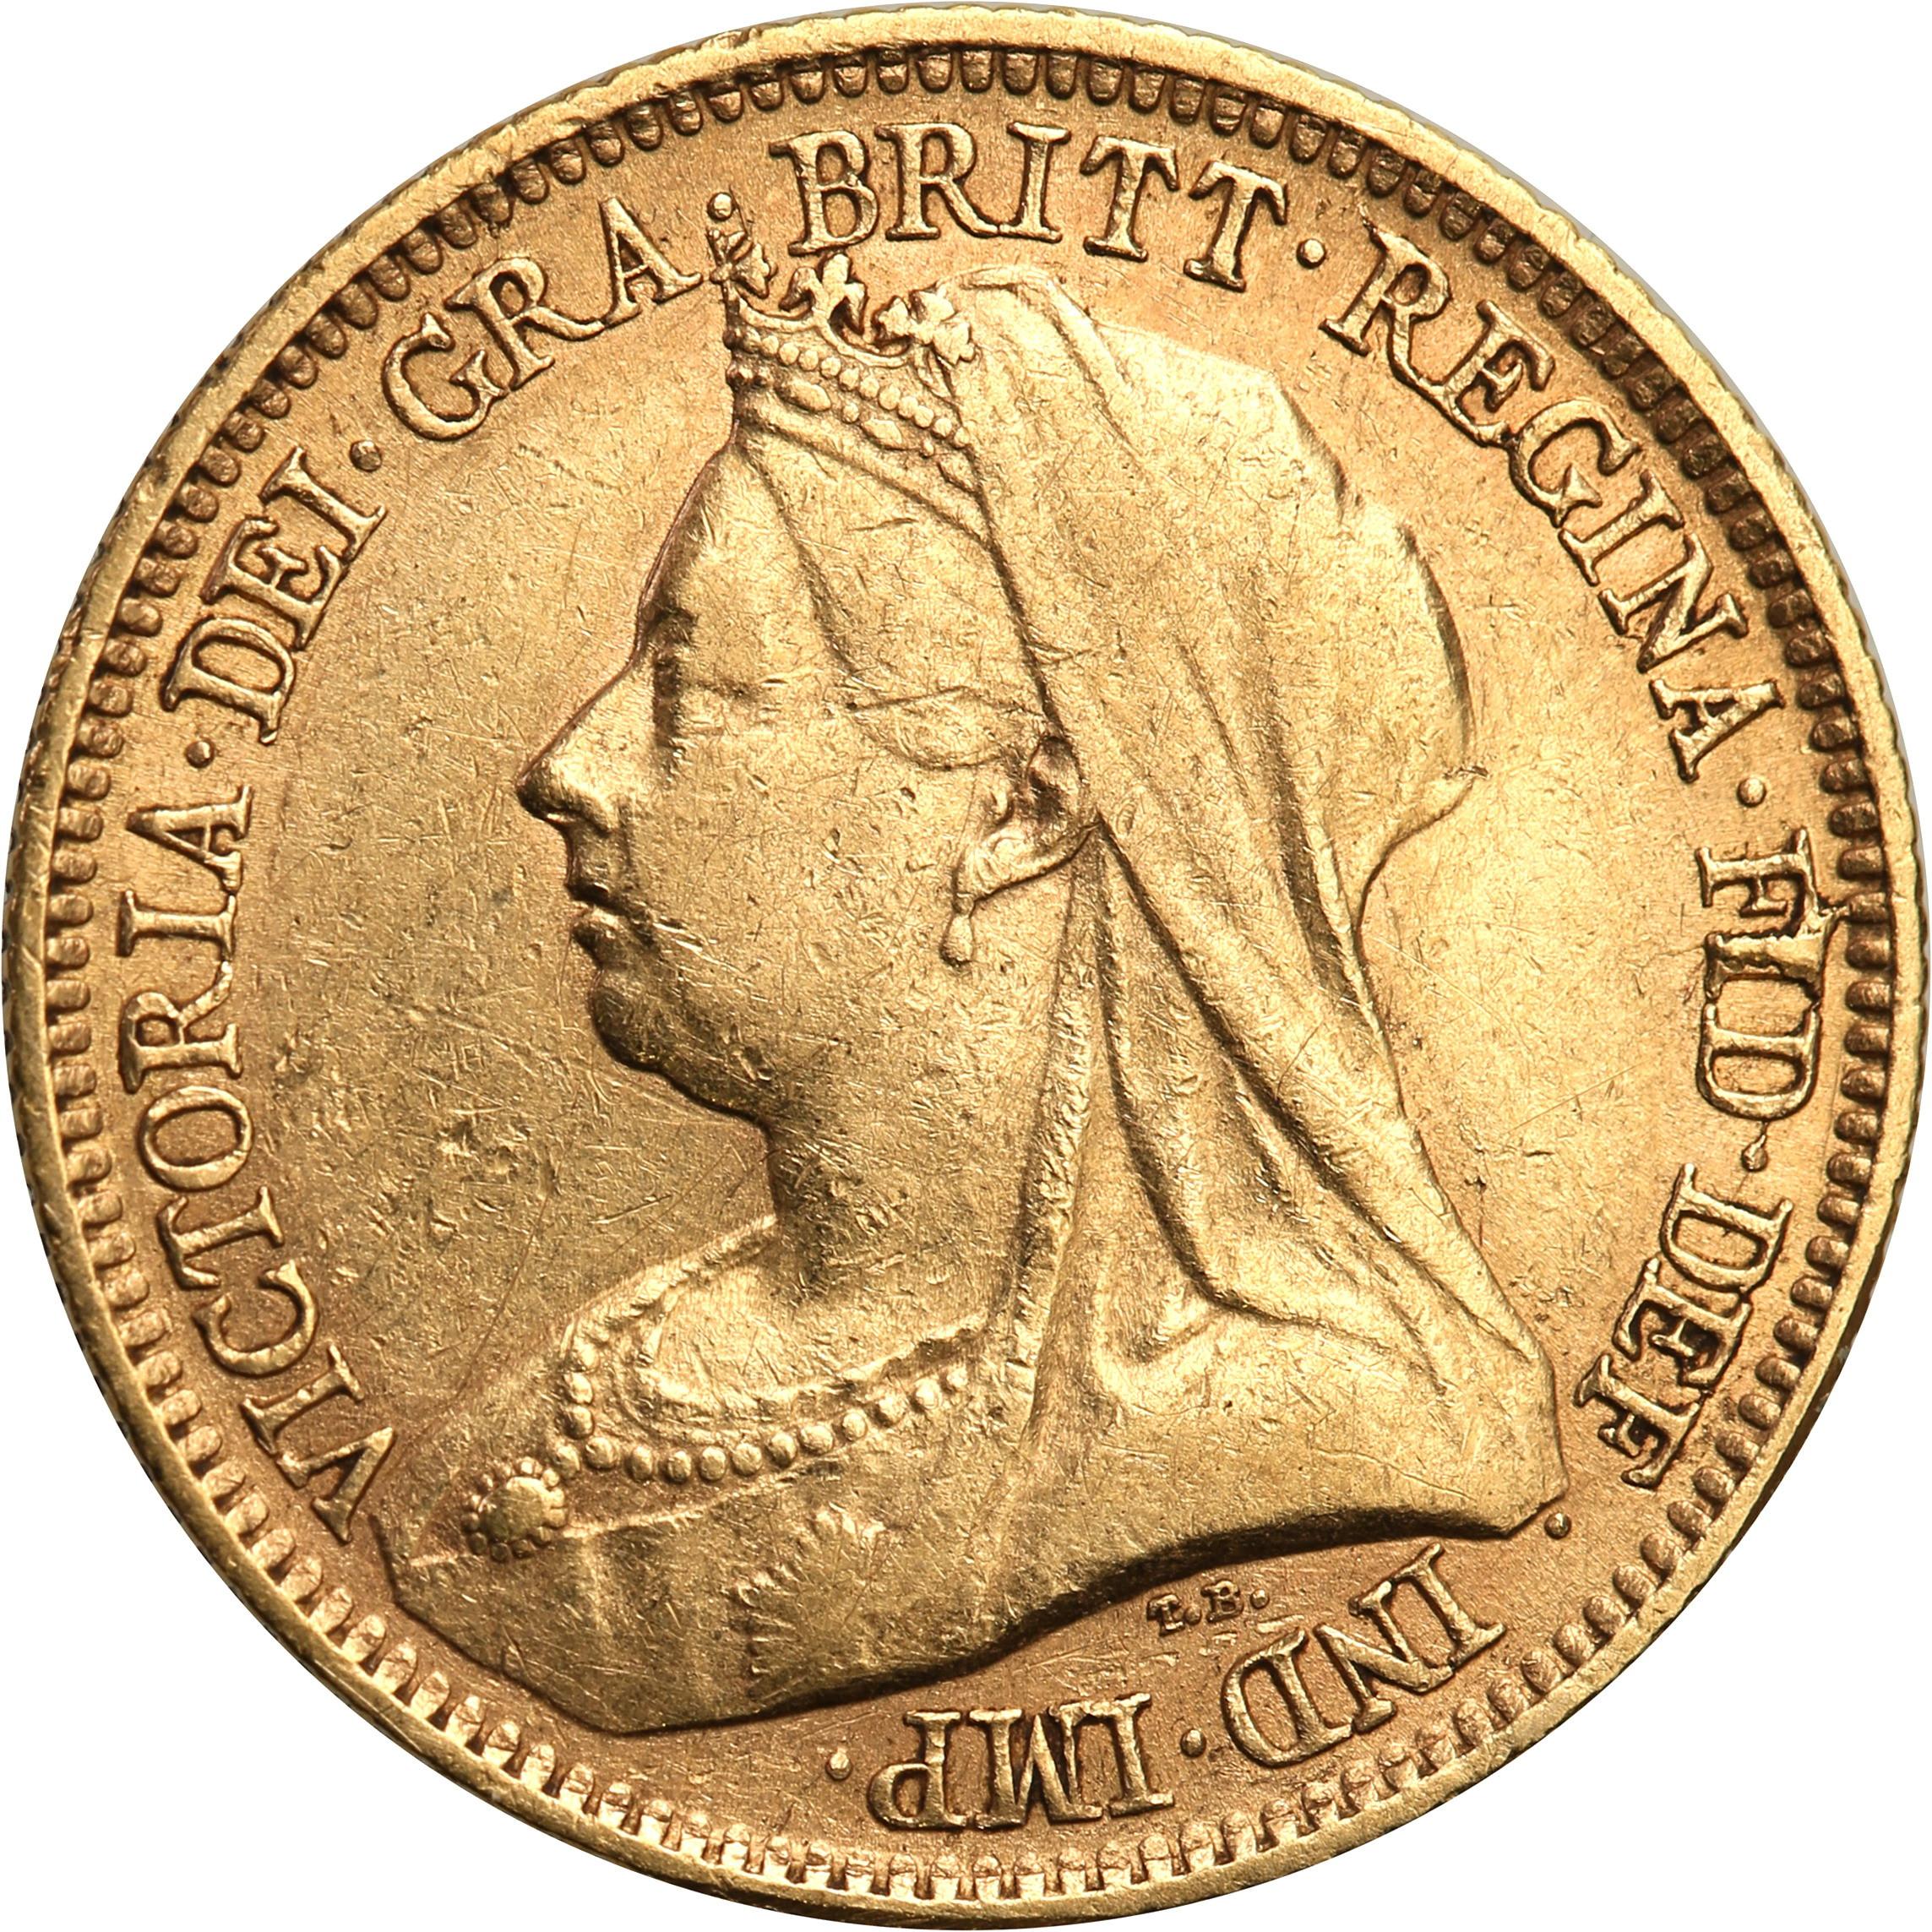 Wielka Brytania 1/2 suwerena 1893 Victoria st. 3+